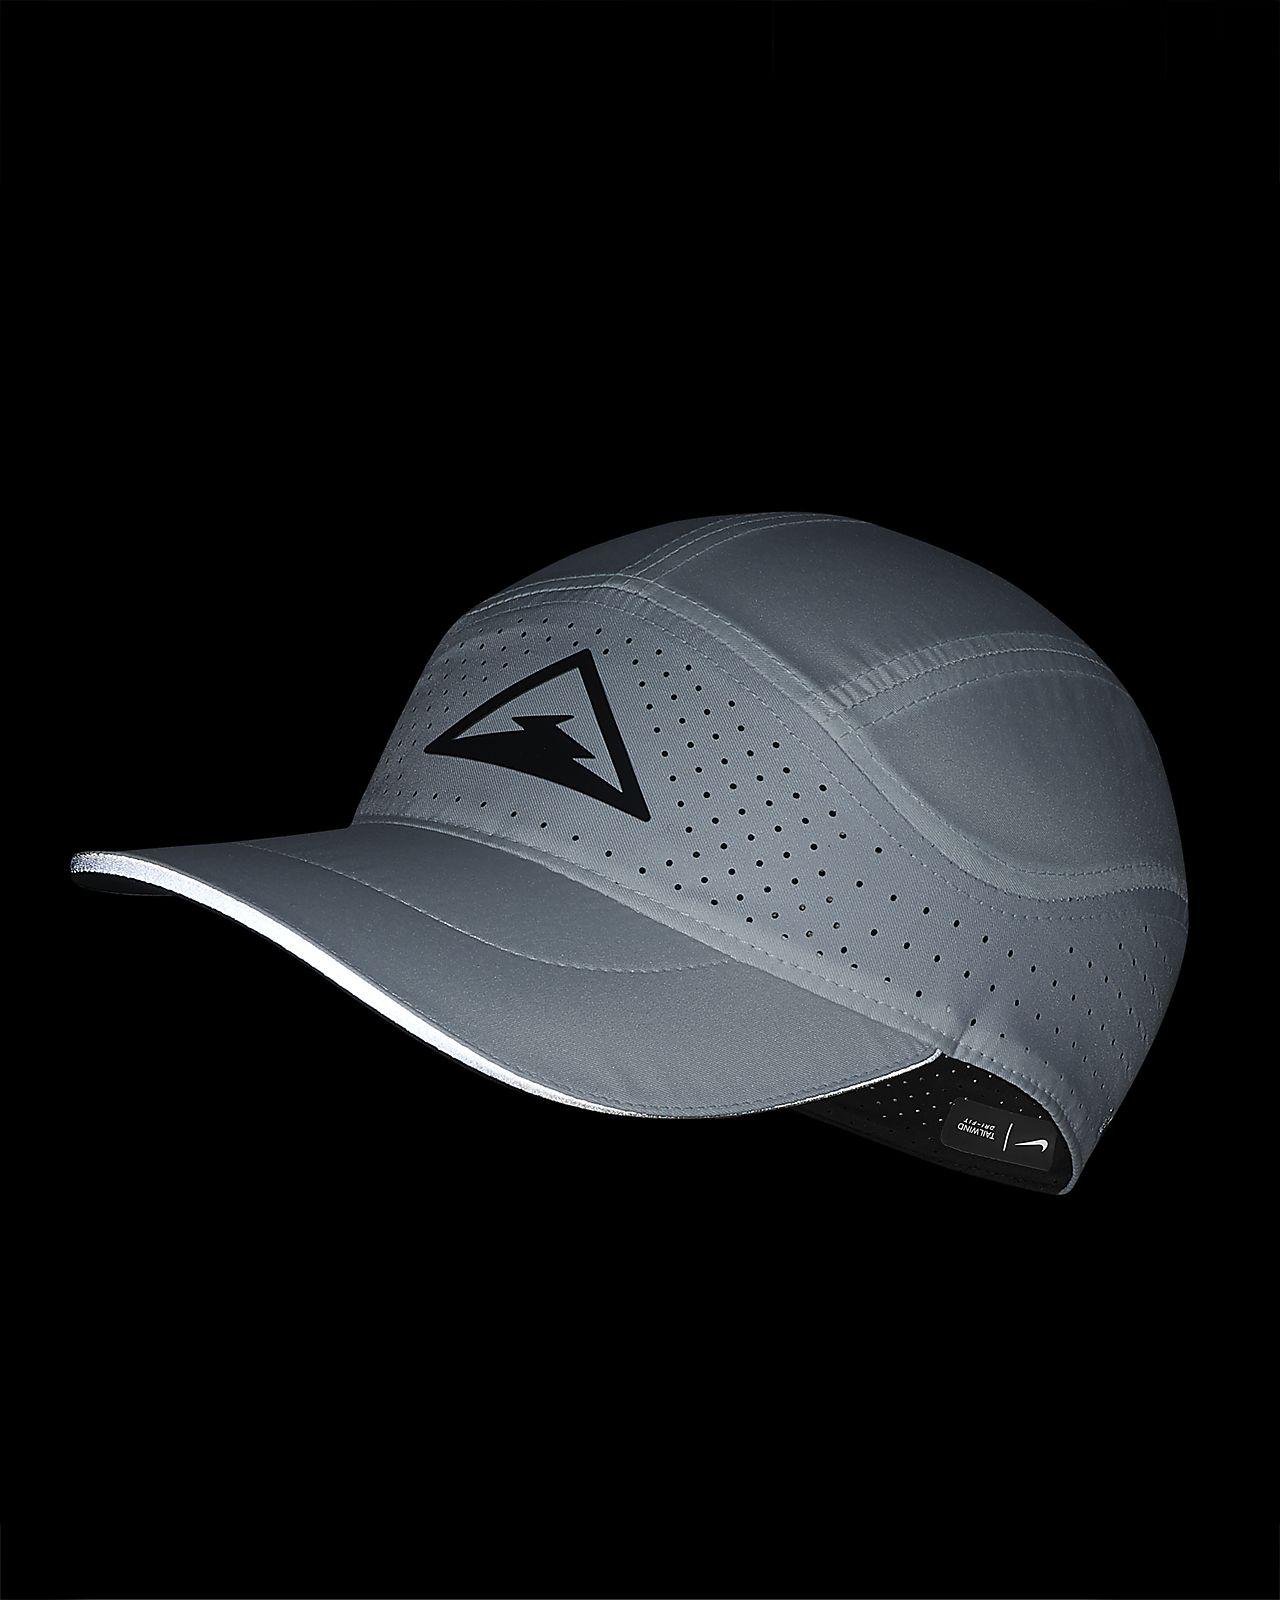 ca23c630e Nike AeroBill Tailwind Running Cap